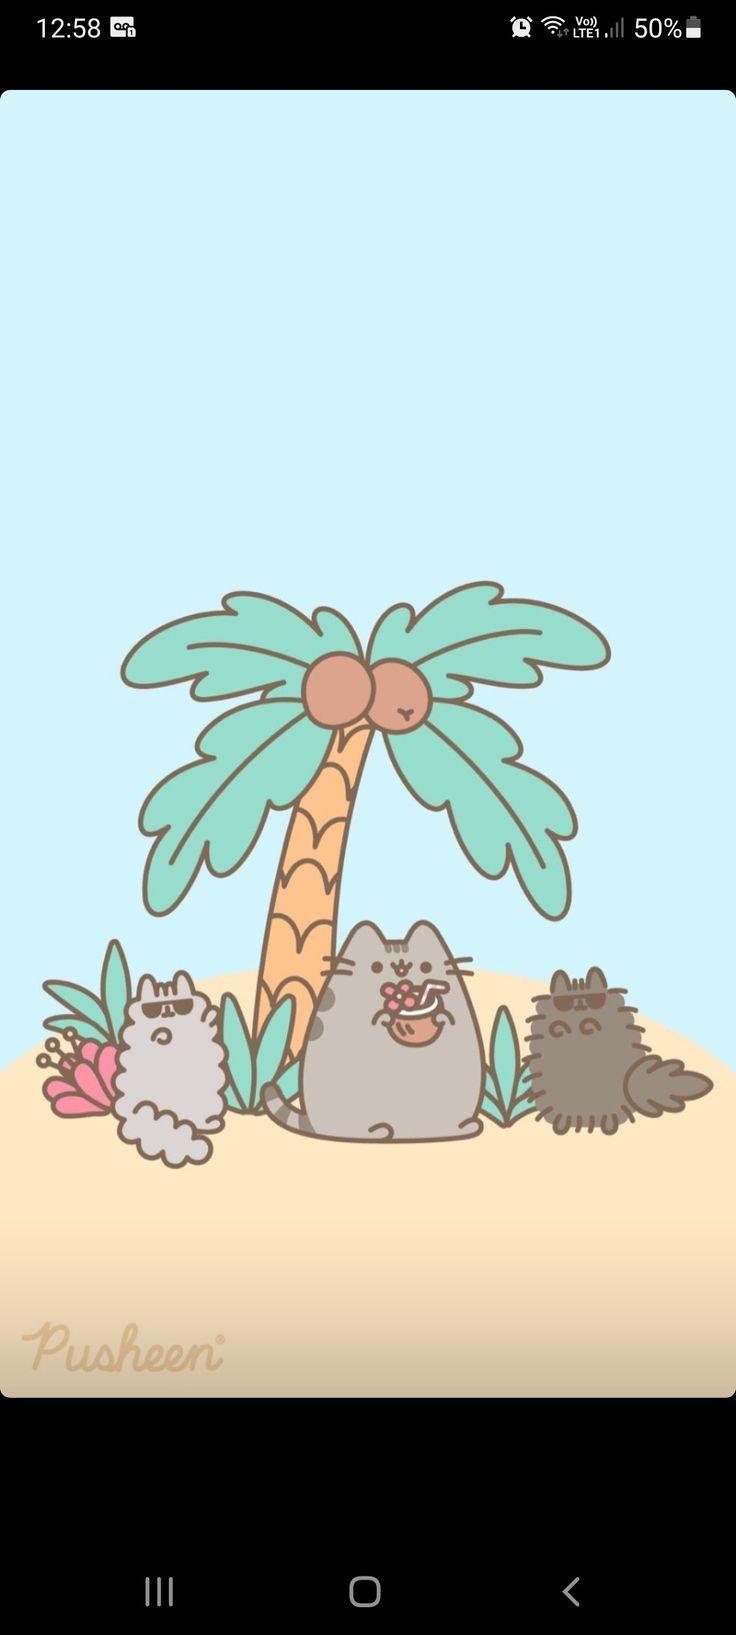 Dawn by ameiro_pk | Pokémon | Know Your Meme